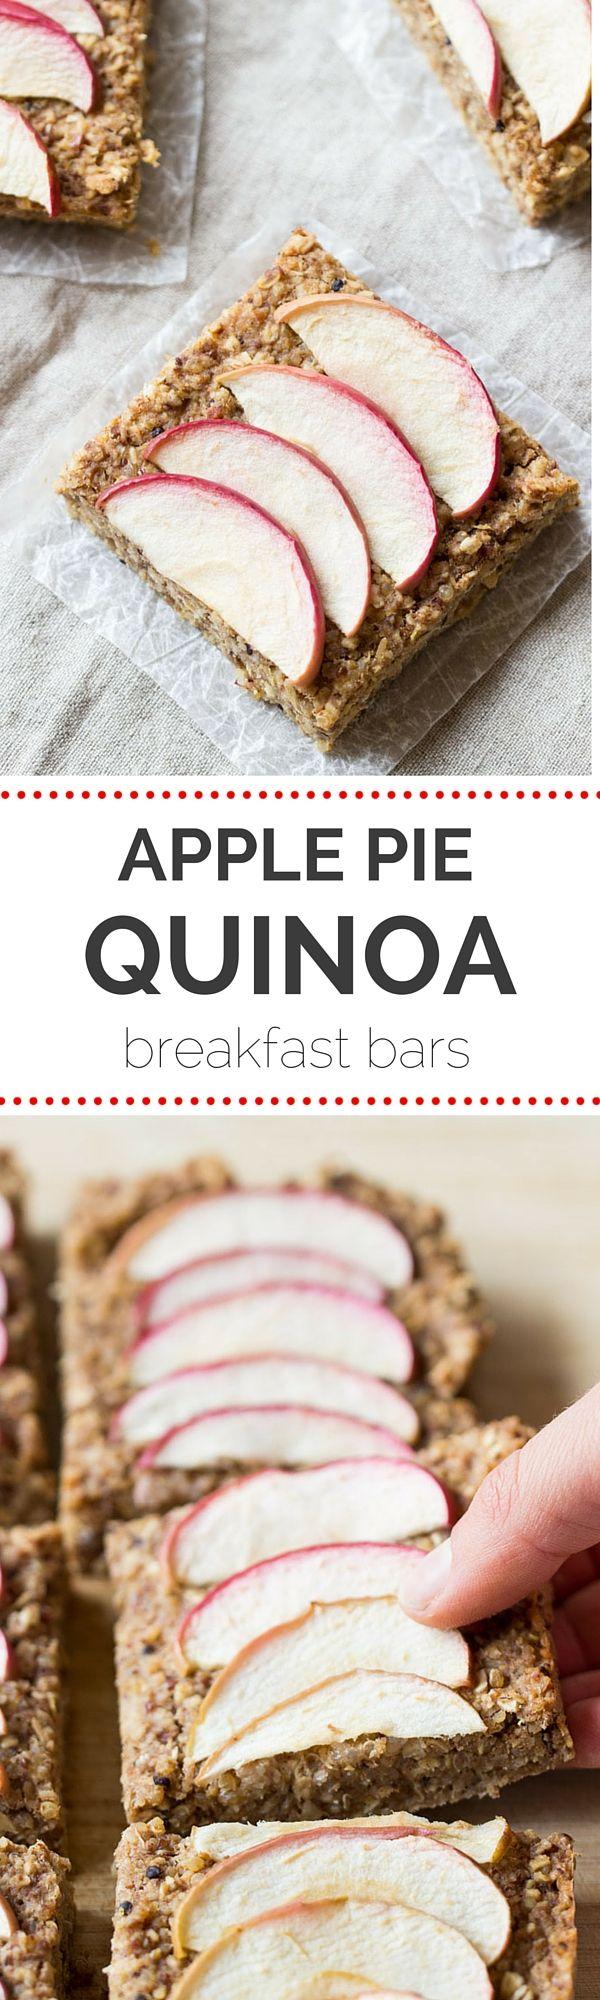 Apple Pie Quinoa Breakfast Bars -- they taste like decadent apple pie, but are actually a healthy breakfast treat. Plus they're gluten-free + vegan!